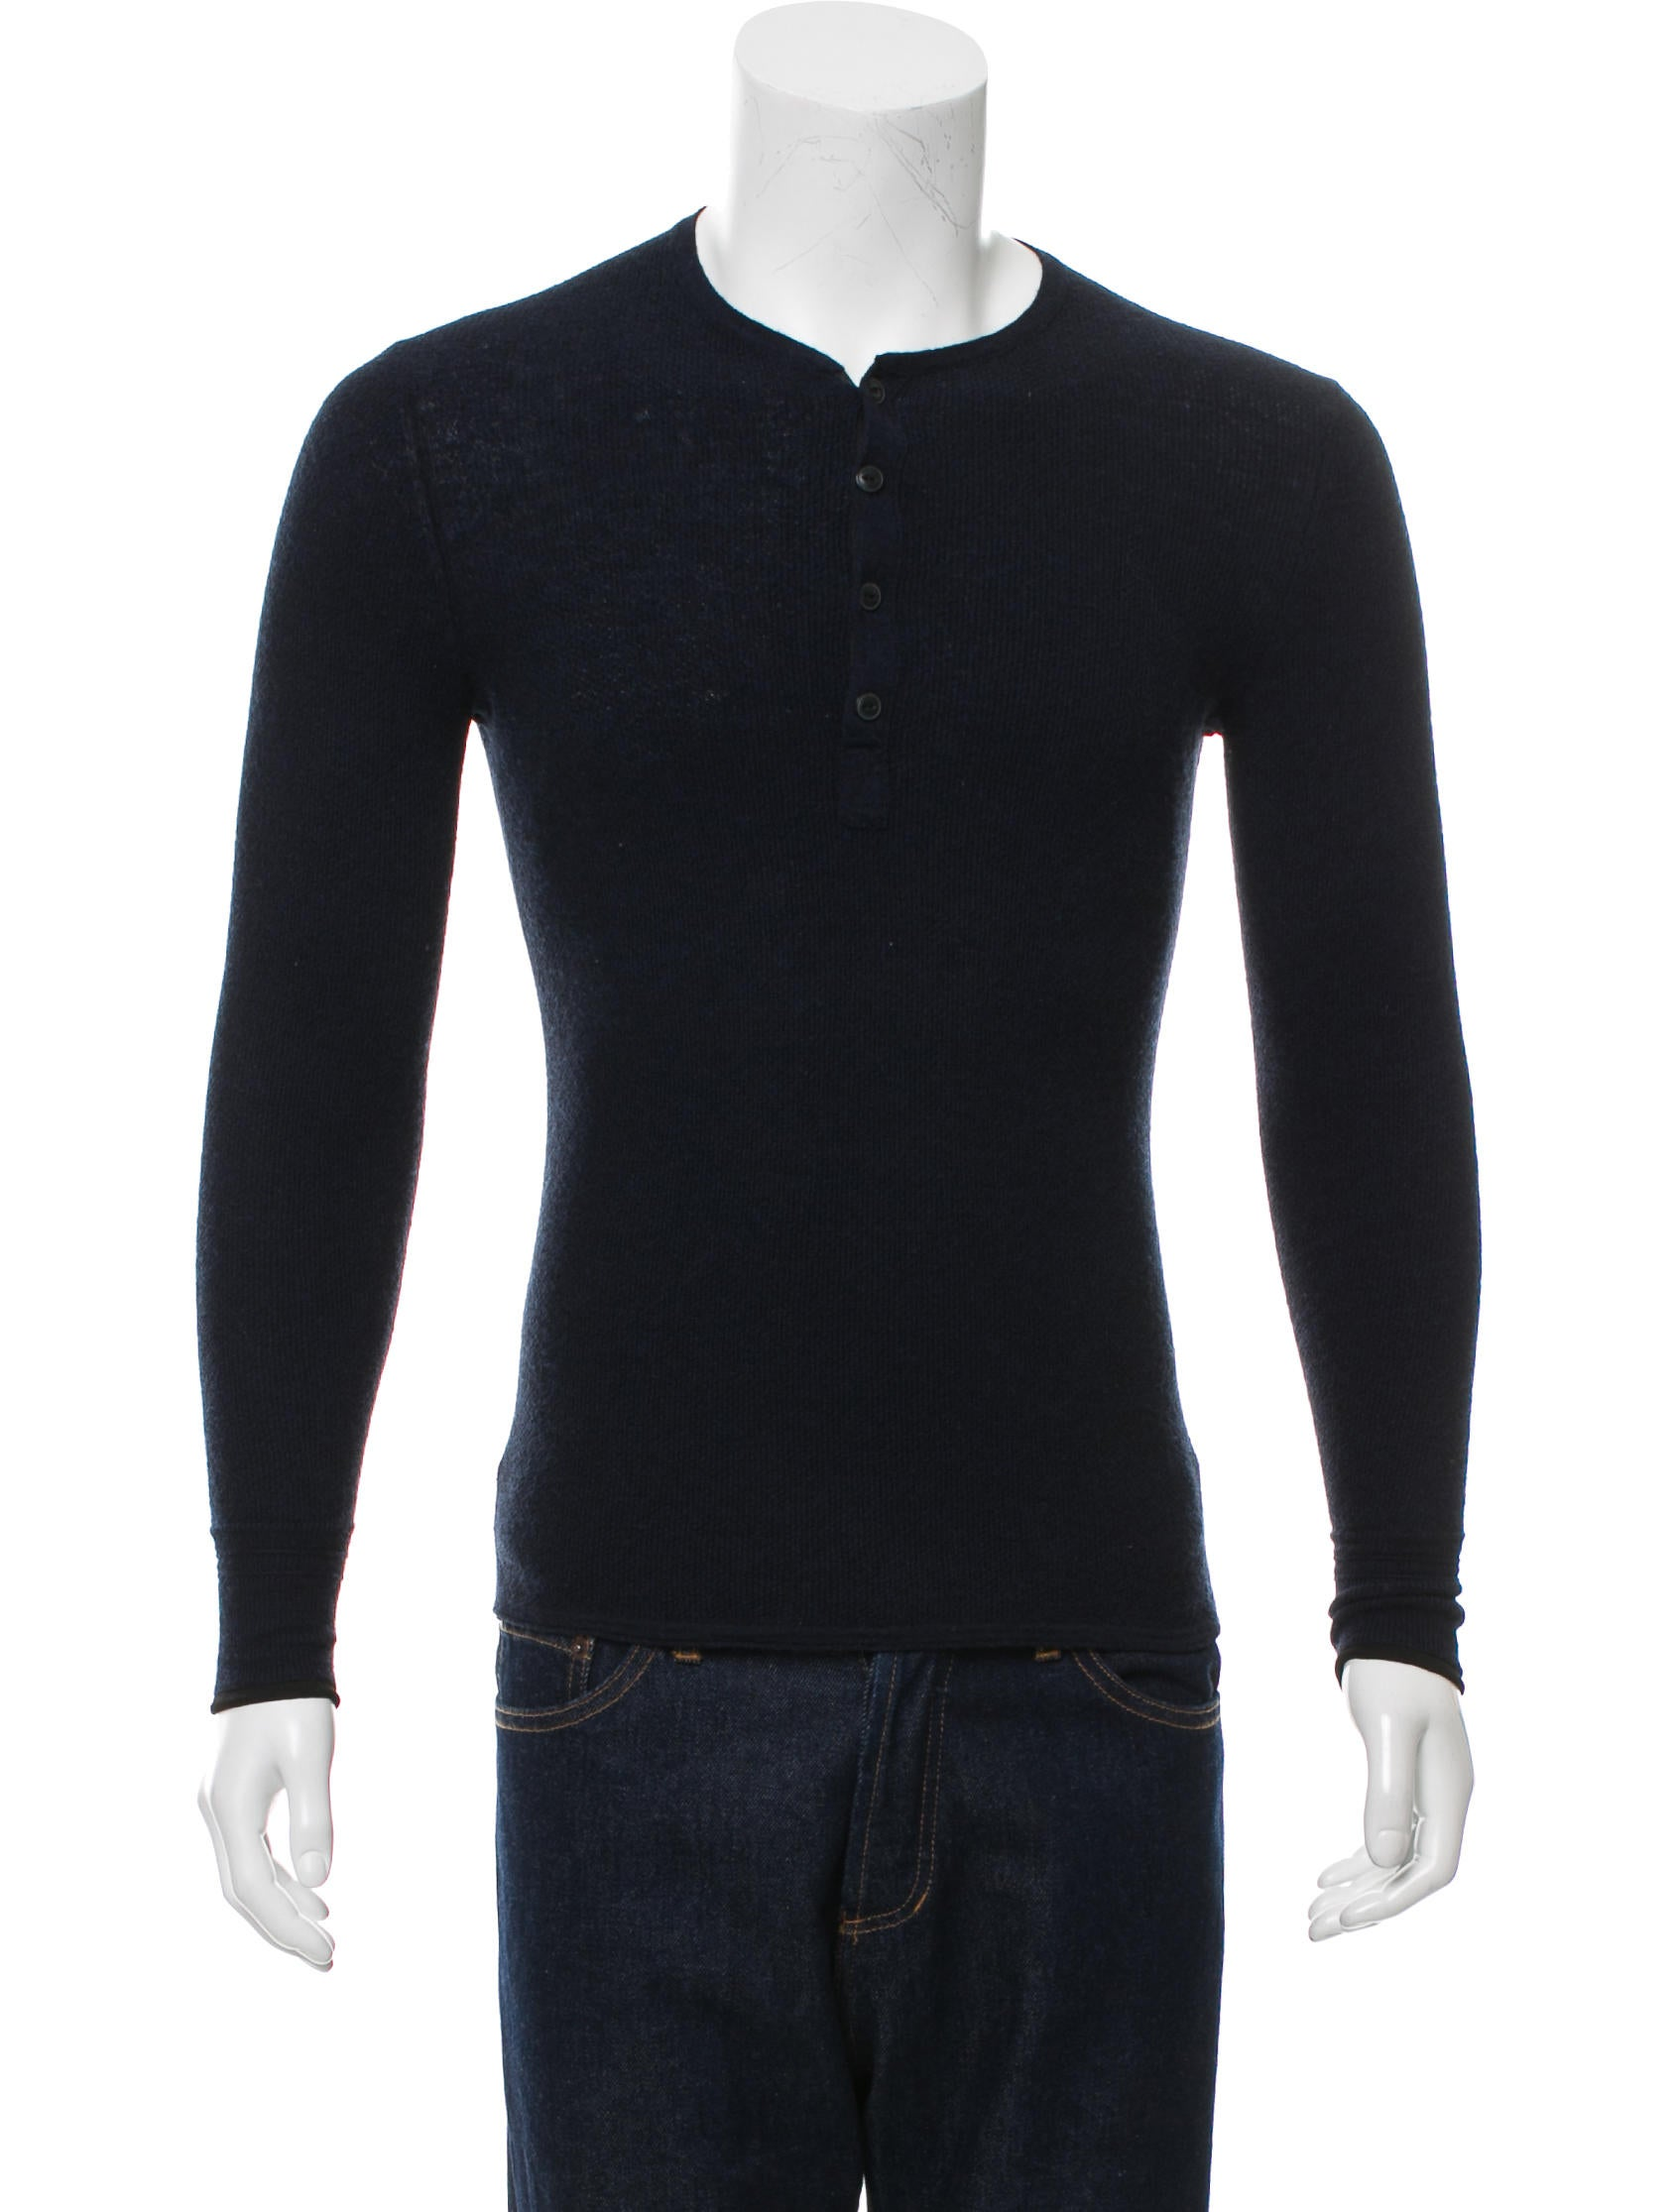 Rag Bone Wool Henley Shirt Clothing Wragb69515 The